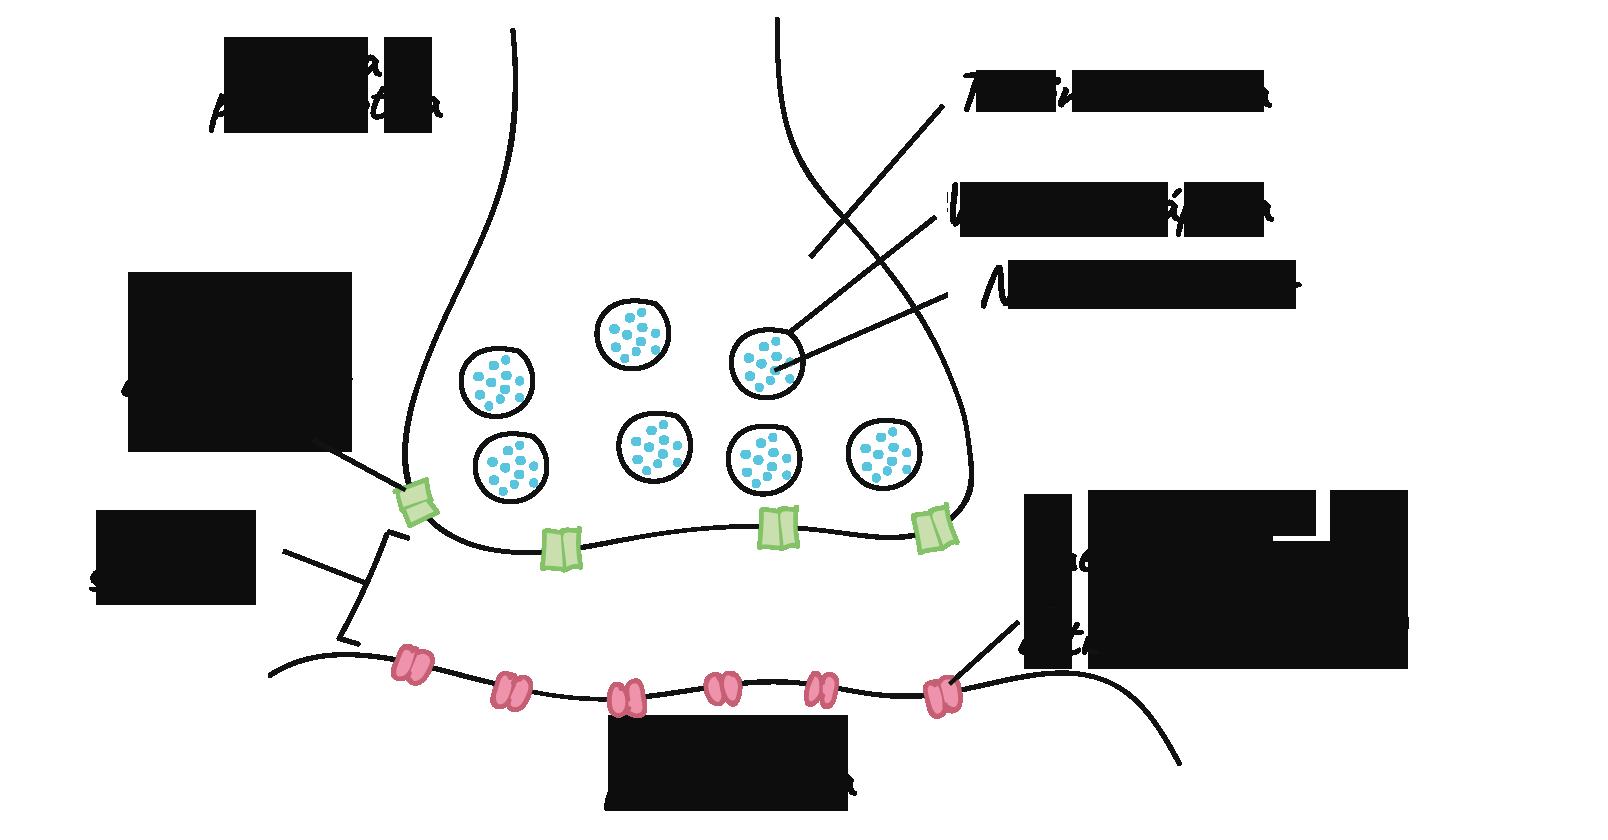 Anatomía de una neurona (video) | Khan Academy